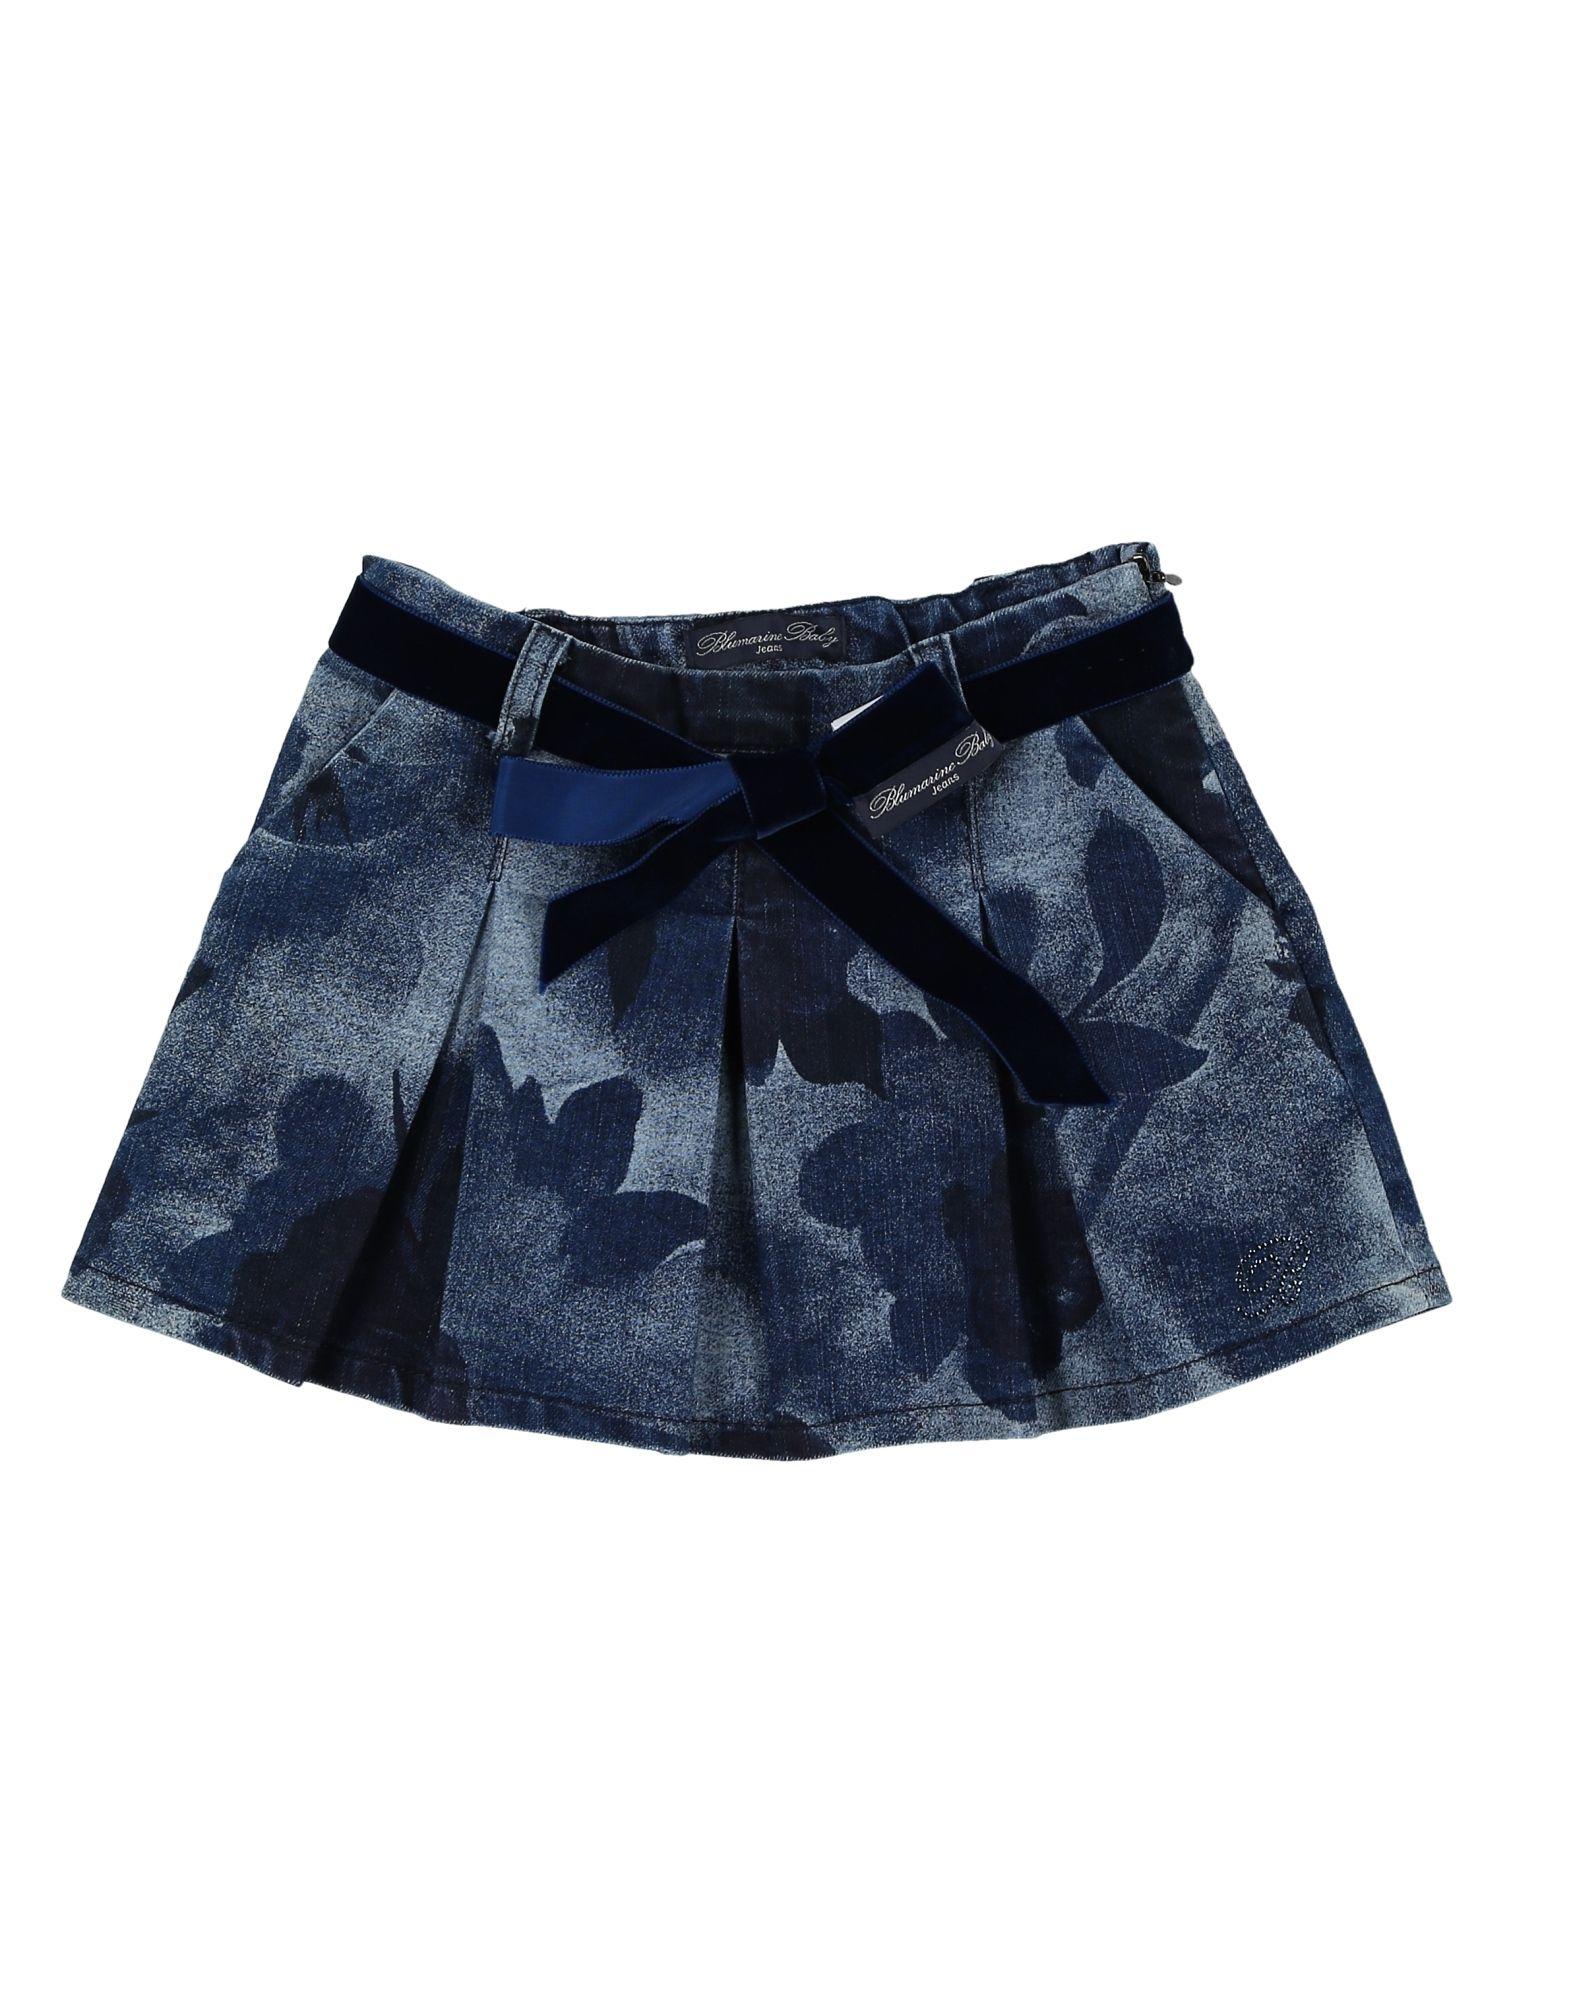 MISS BLUMARINE Джинсовая юбка miss blumarine ремень